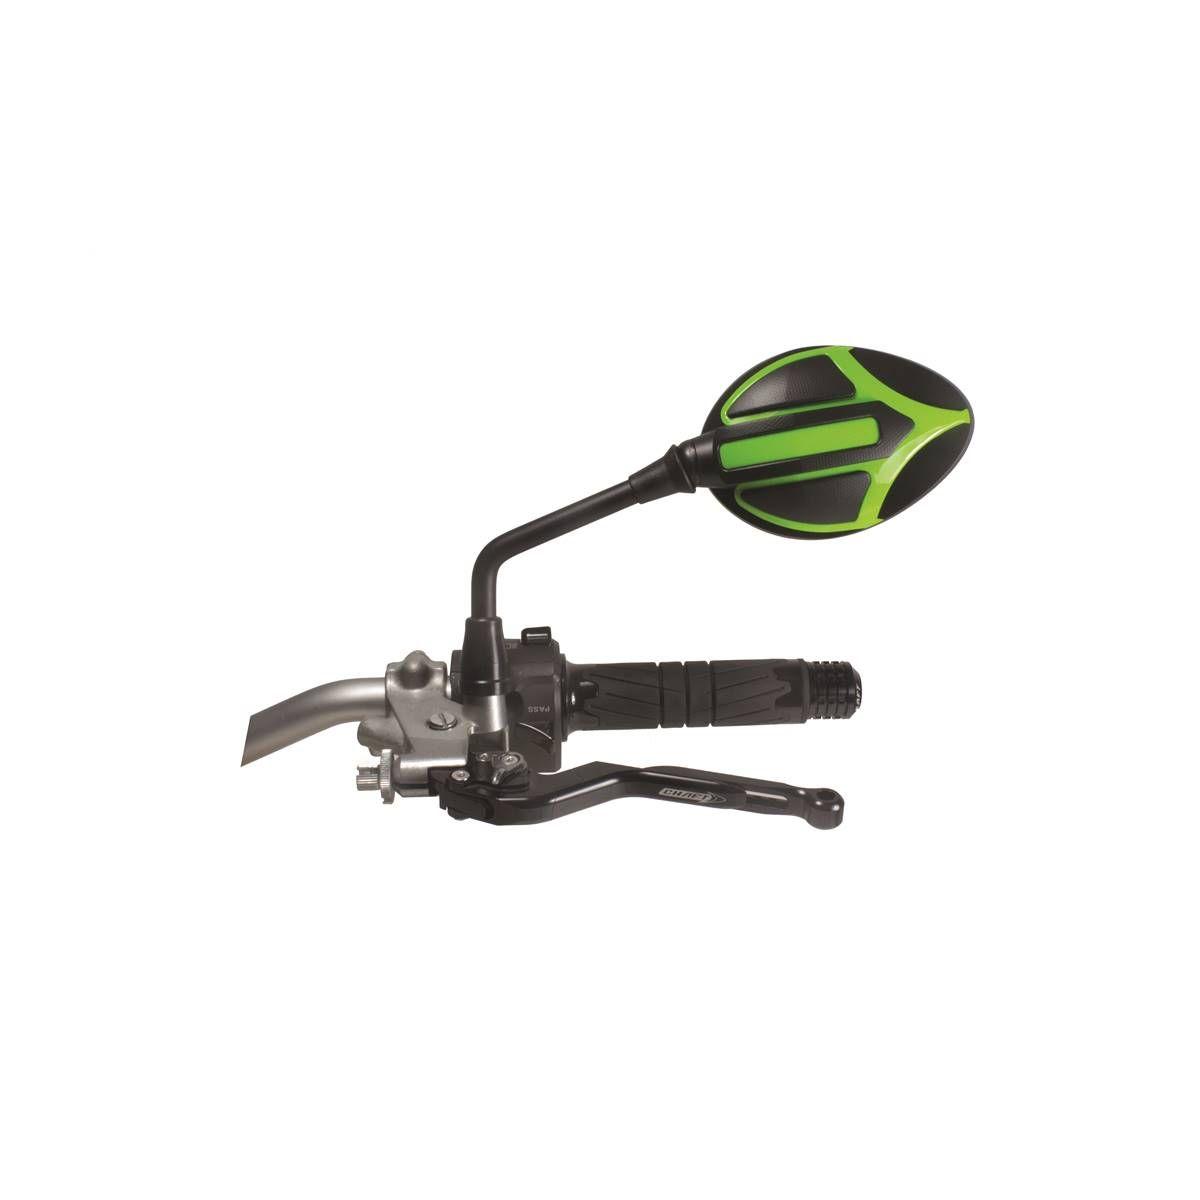 Rétroviseur réversible homologué Chaft Candy noir mat/vert